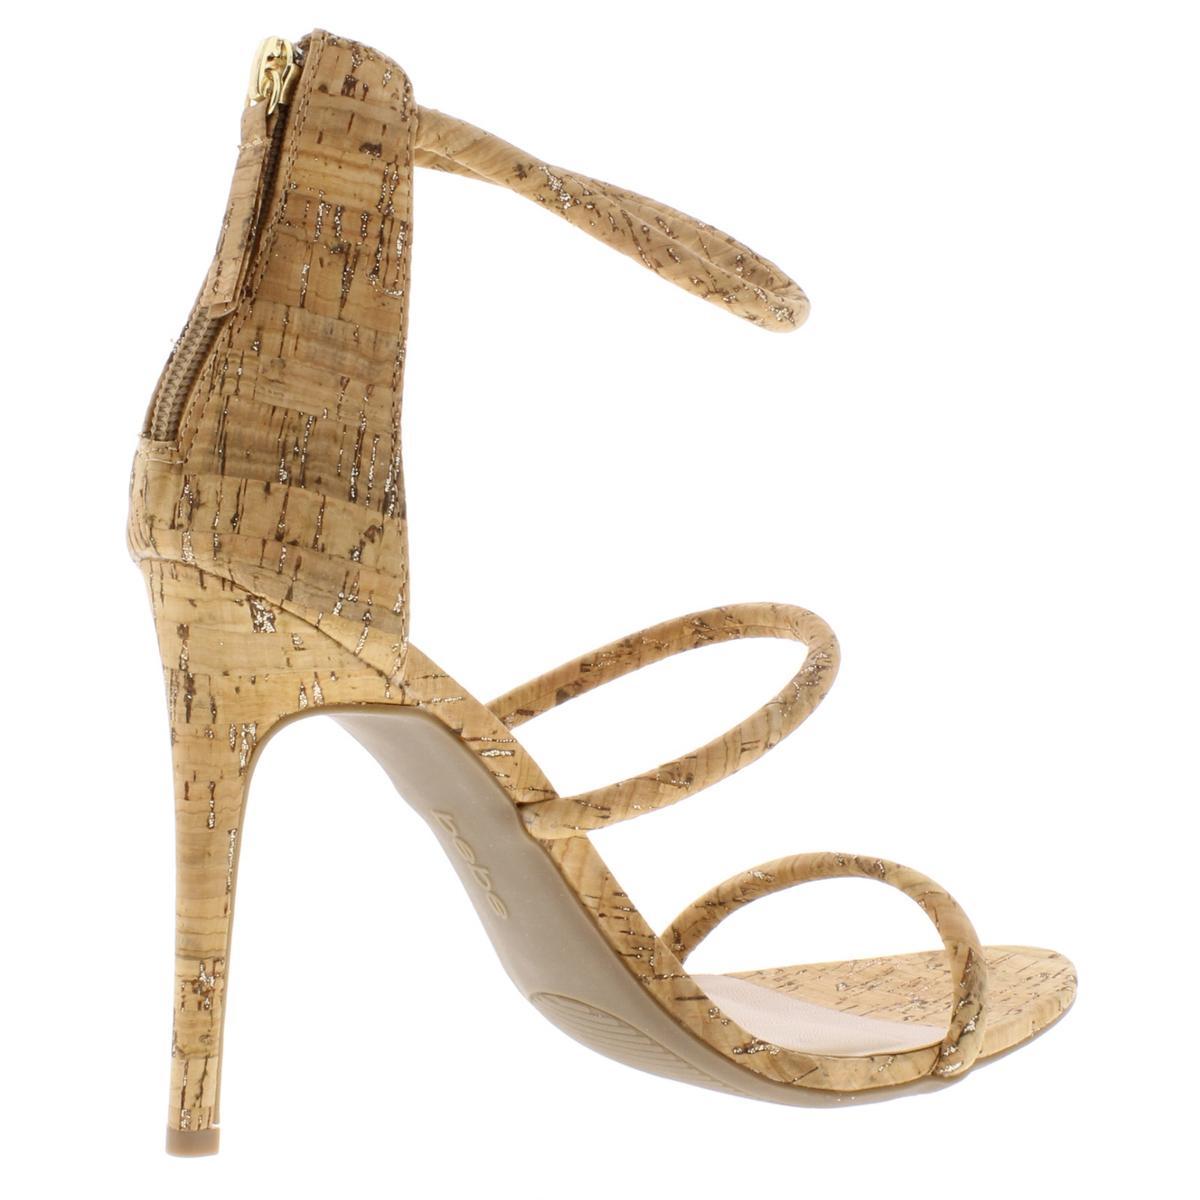 Bebe-Womens-Berdine-Strappy-Textured-Ankle-Strap-Dress-Sandals-Heels-BHFO-6118 thumbnail 6